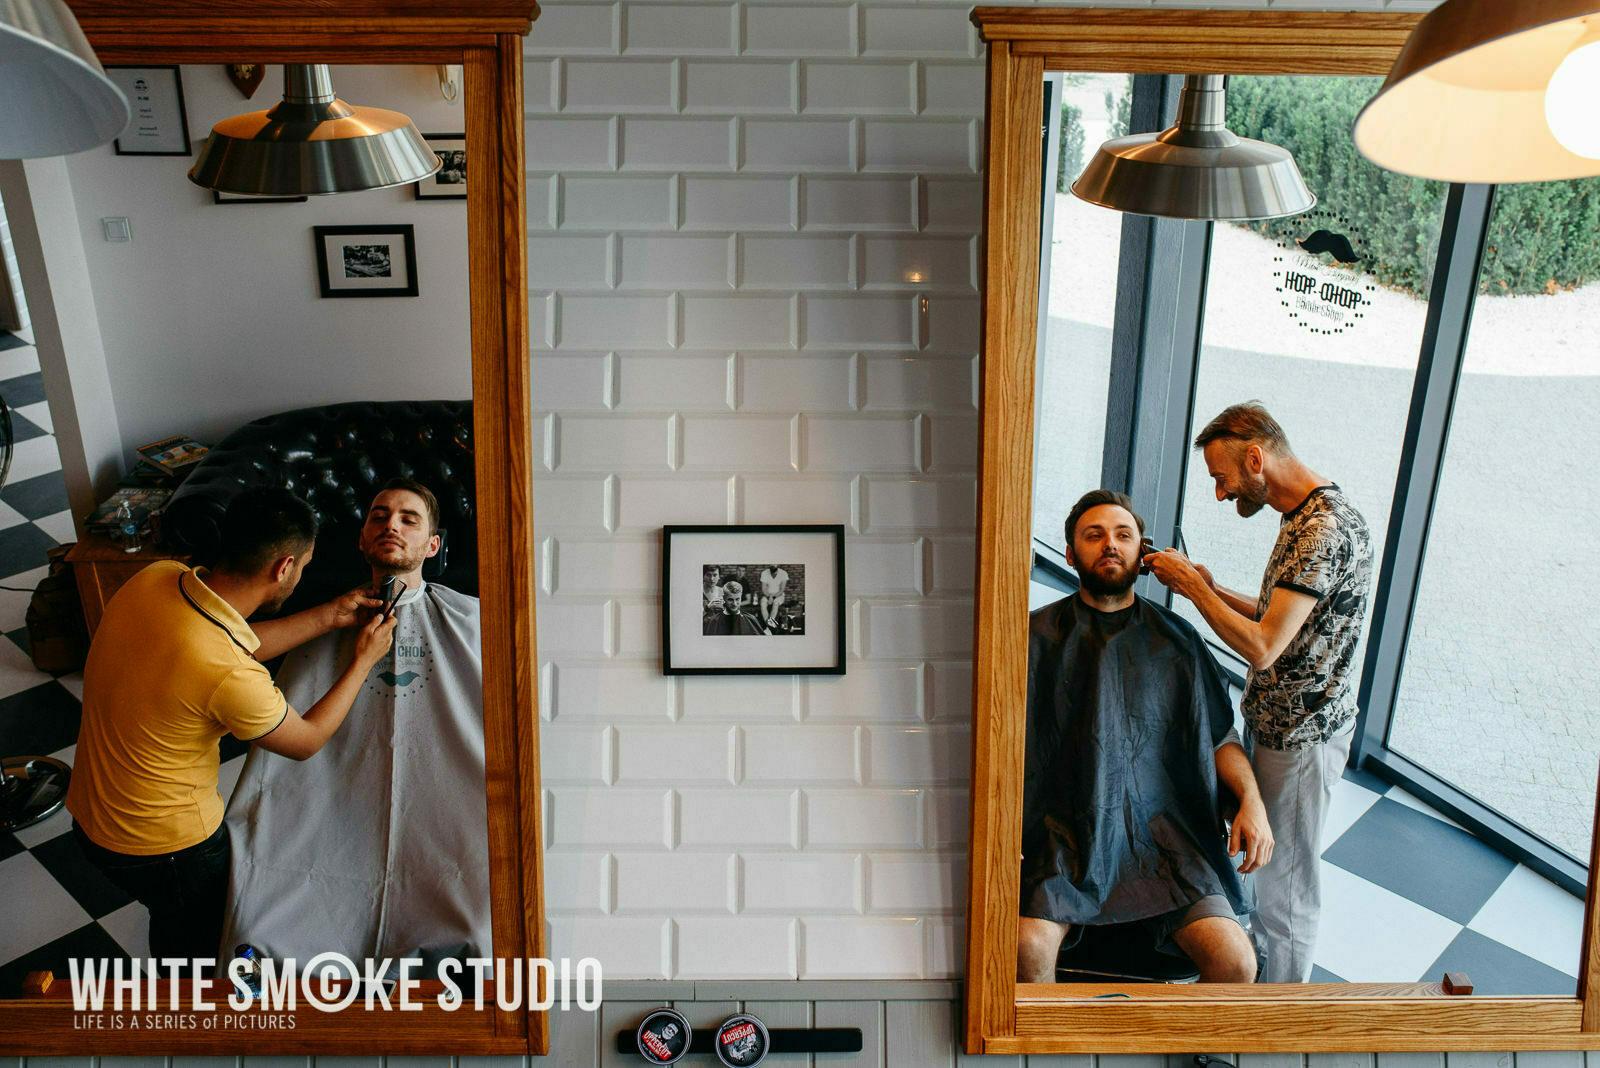 Kasia_Artur_007_hopchop_barbershop